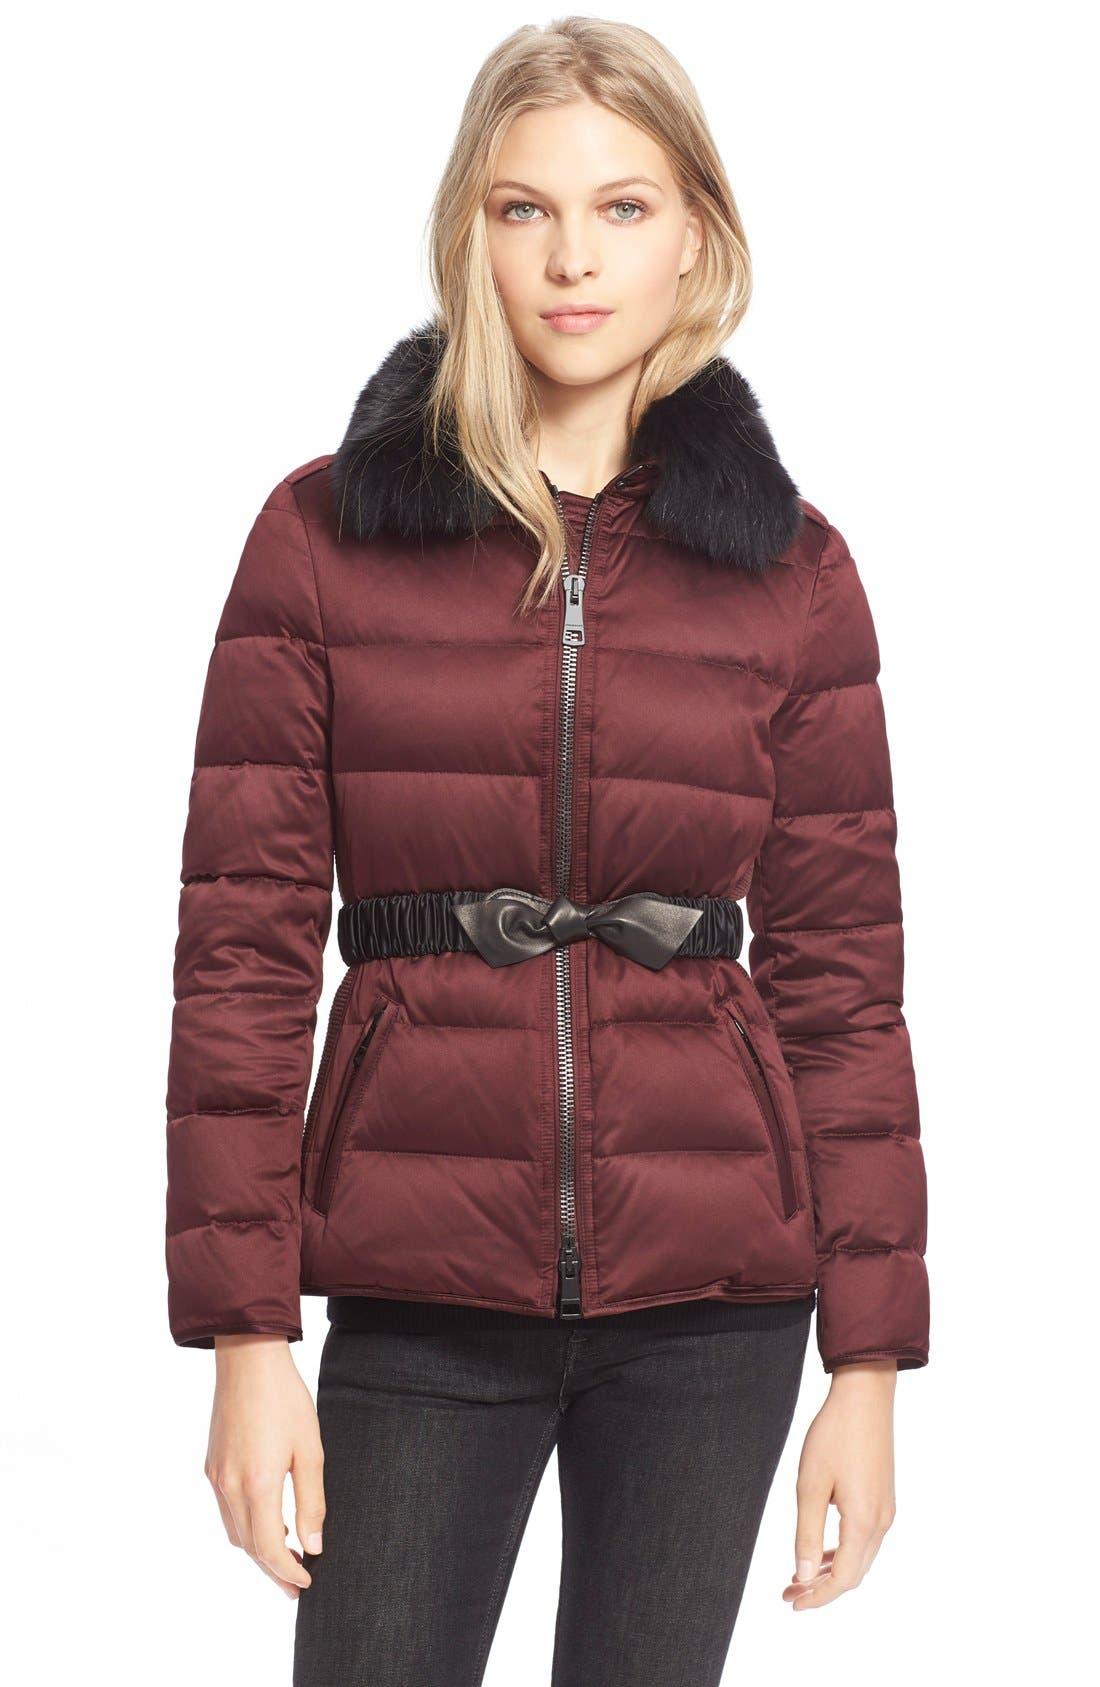 Main Image - BurberryBrit Belted Down Jacket withGenuineFoxFurCollar